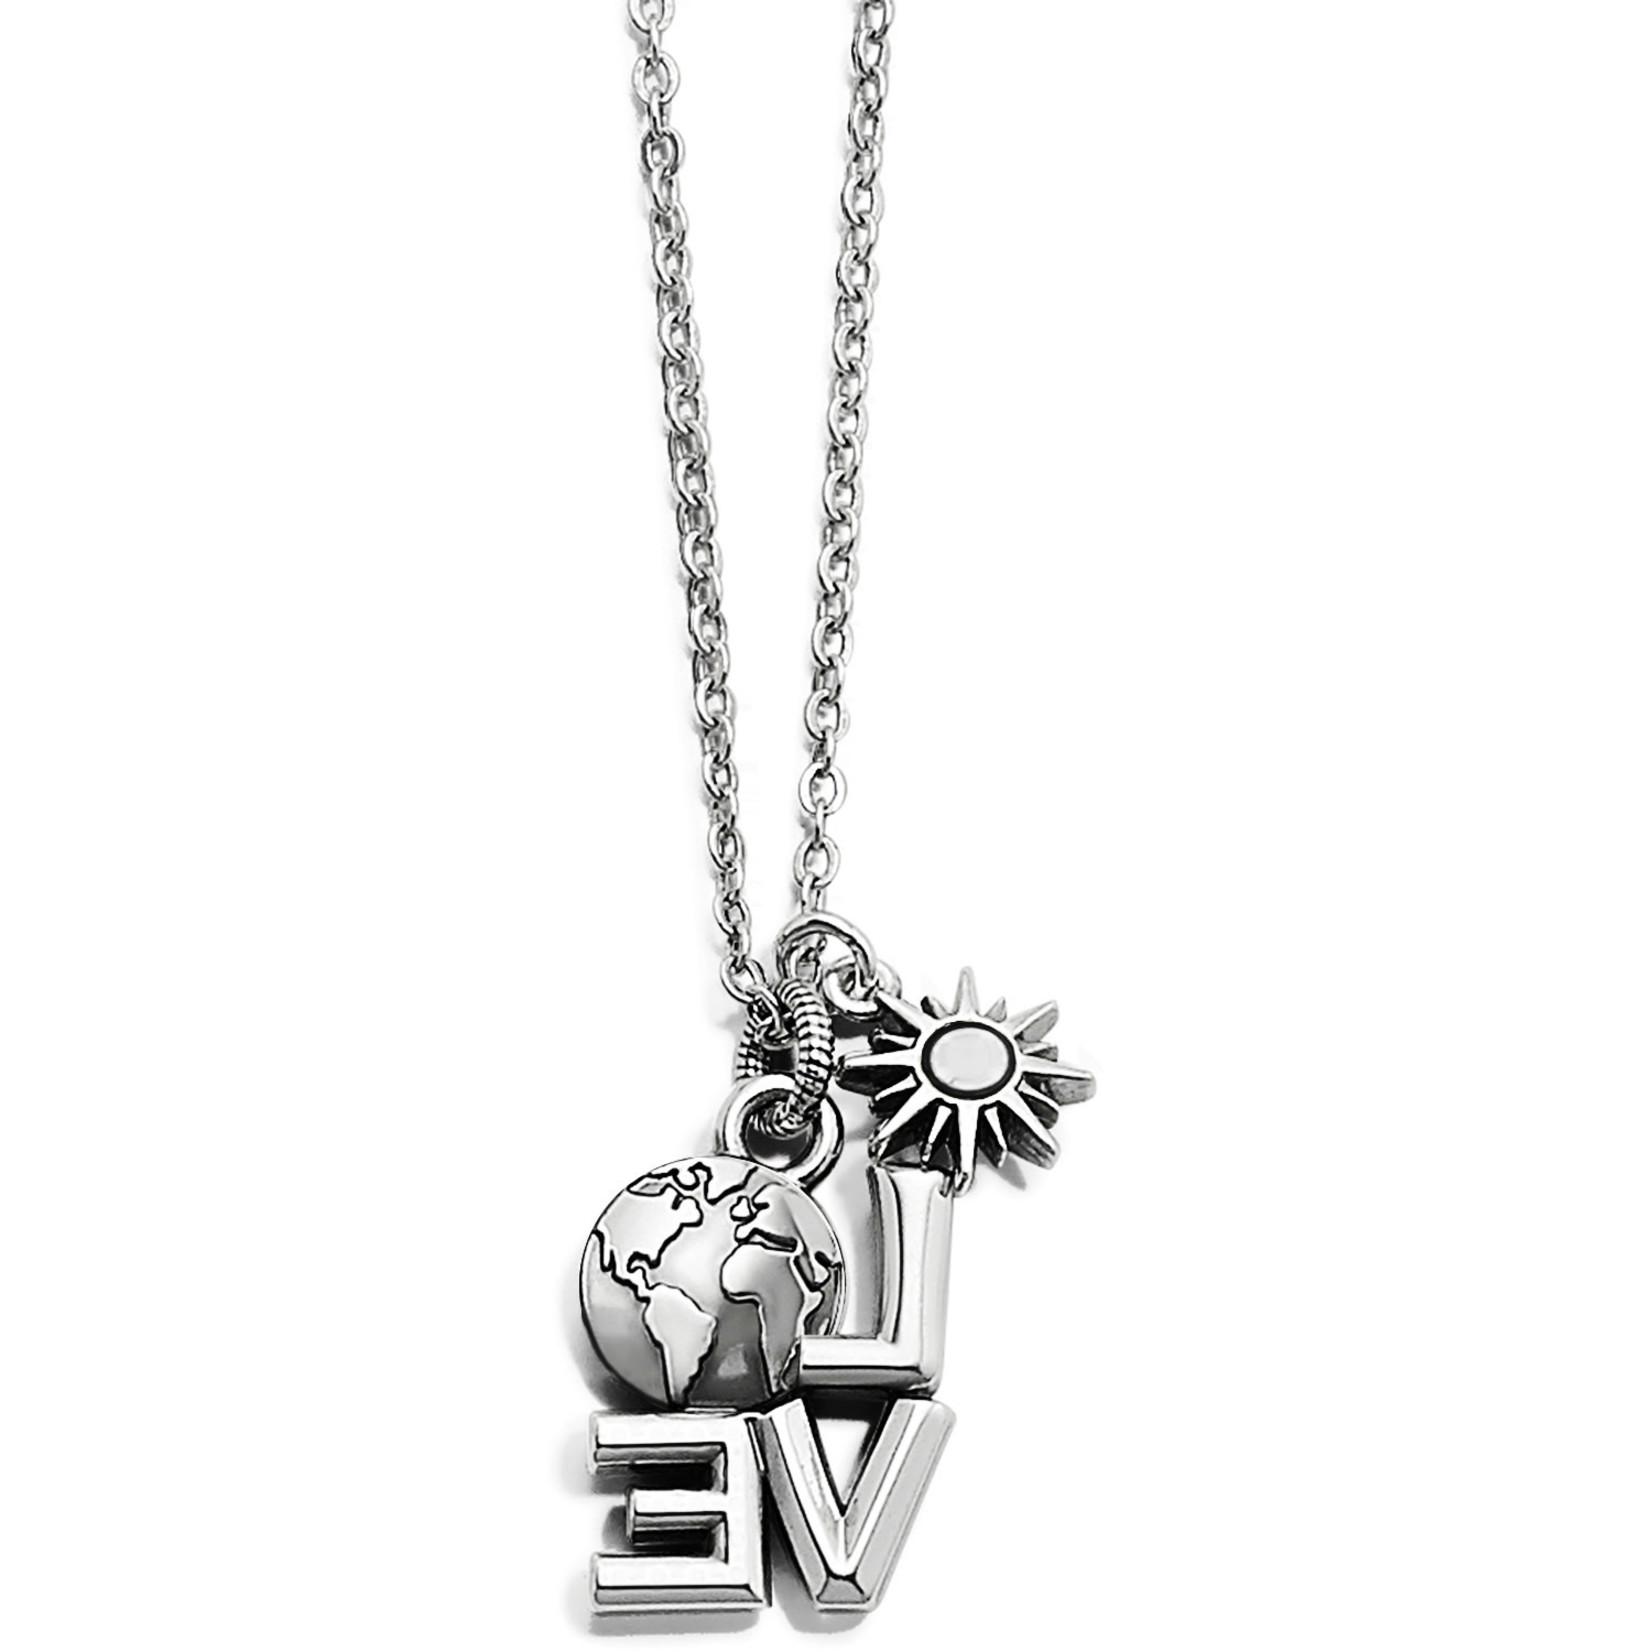 Brighton Love Earth Necklace